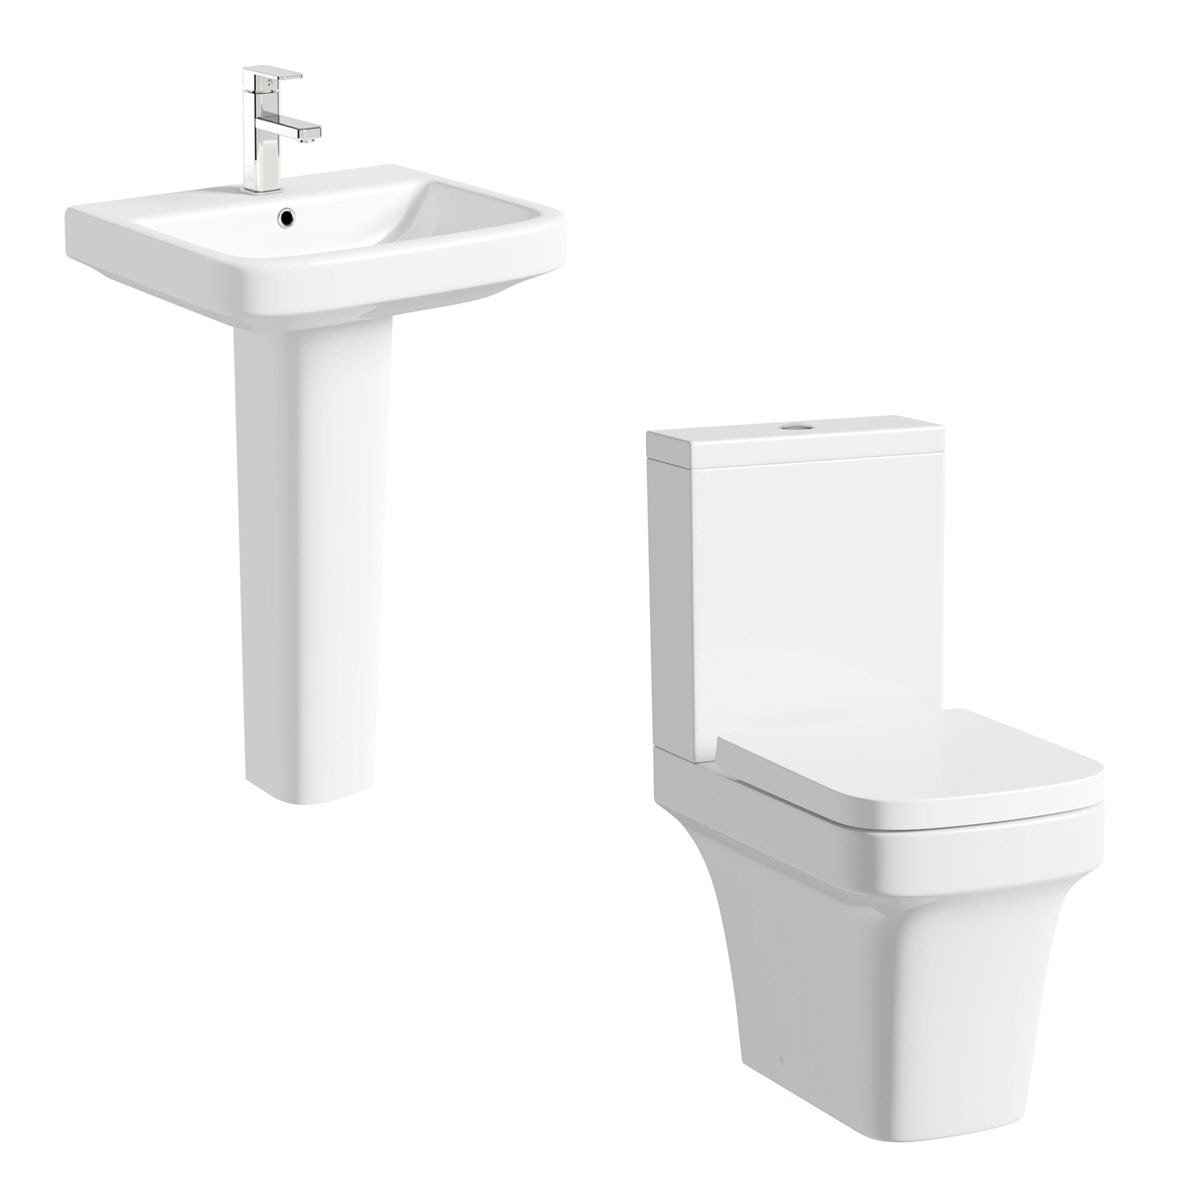 Mode Carter cloakroom suite with full pedestal basin 555mm